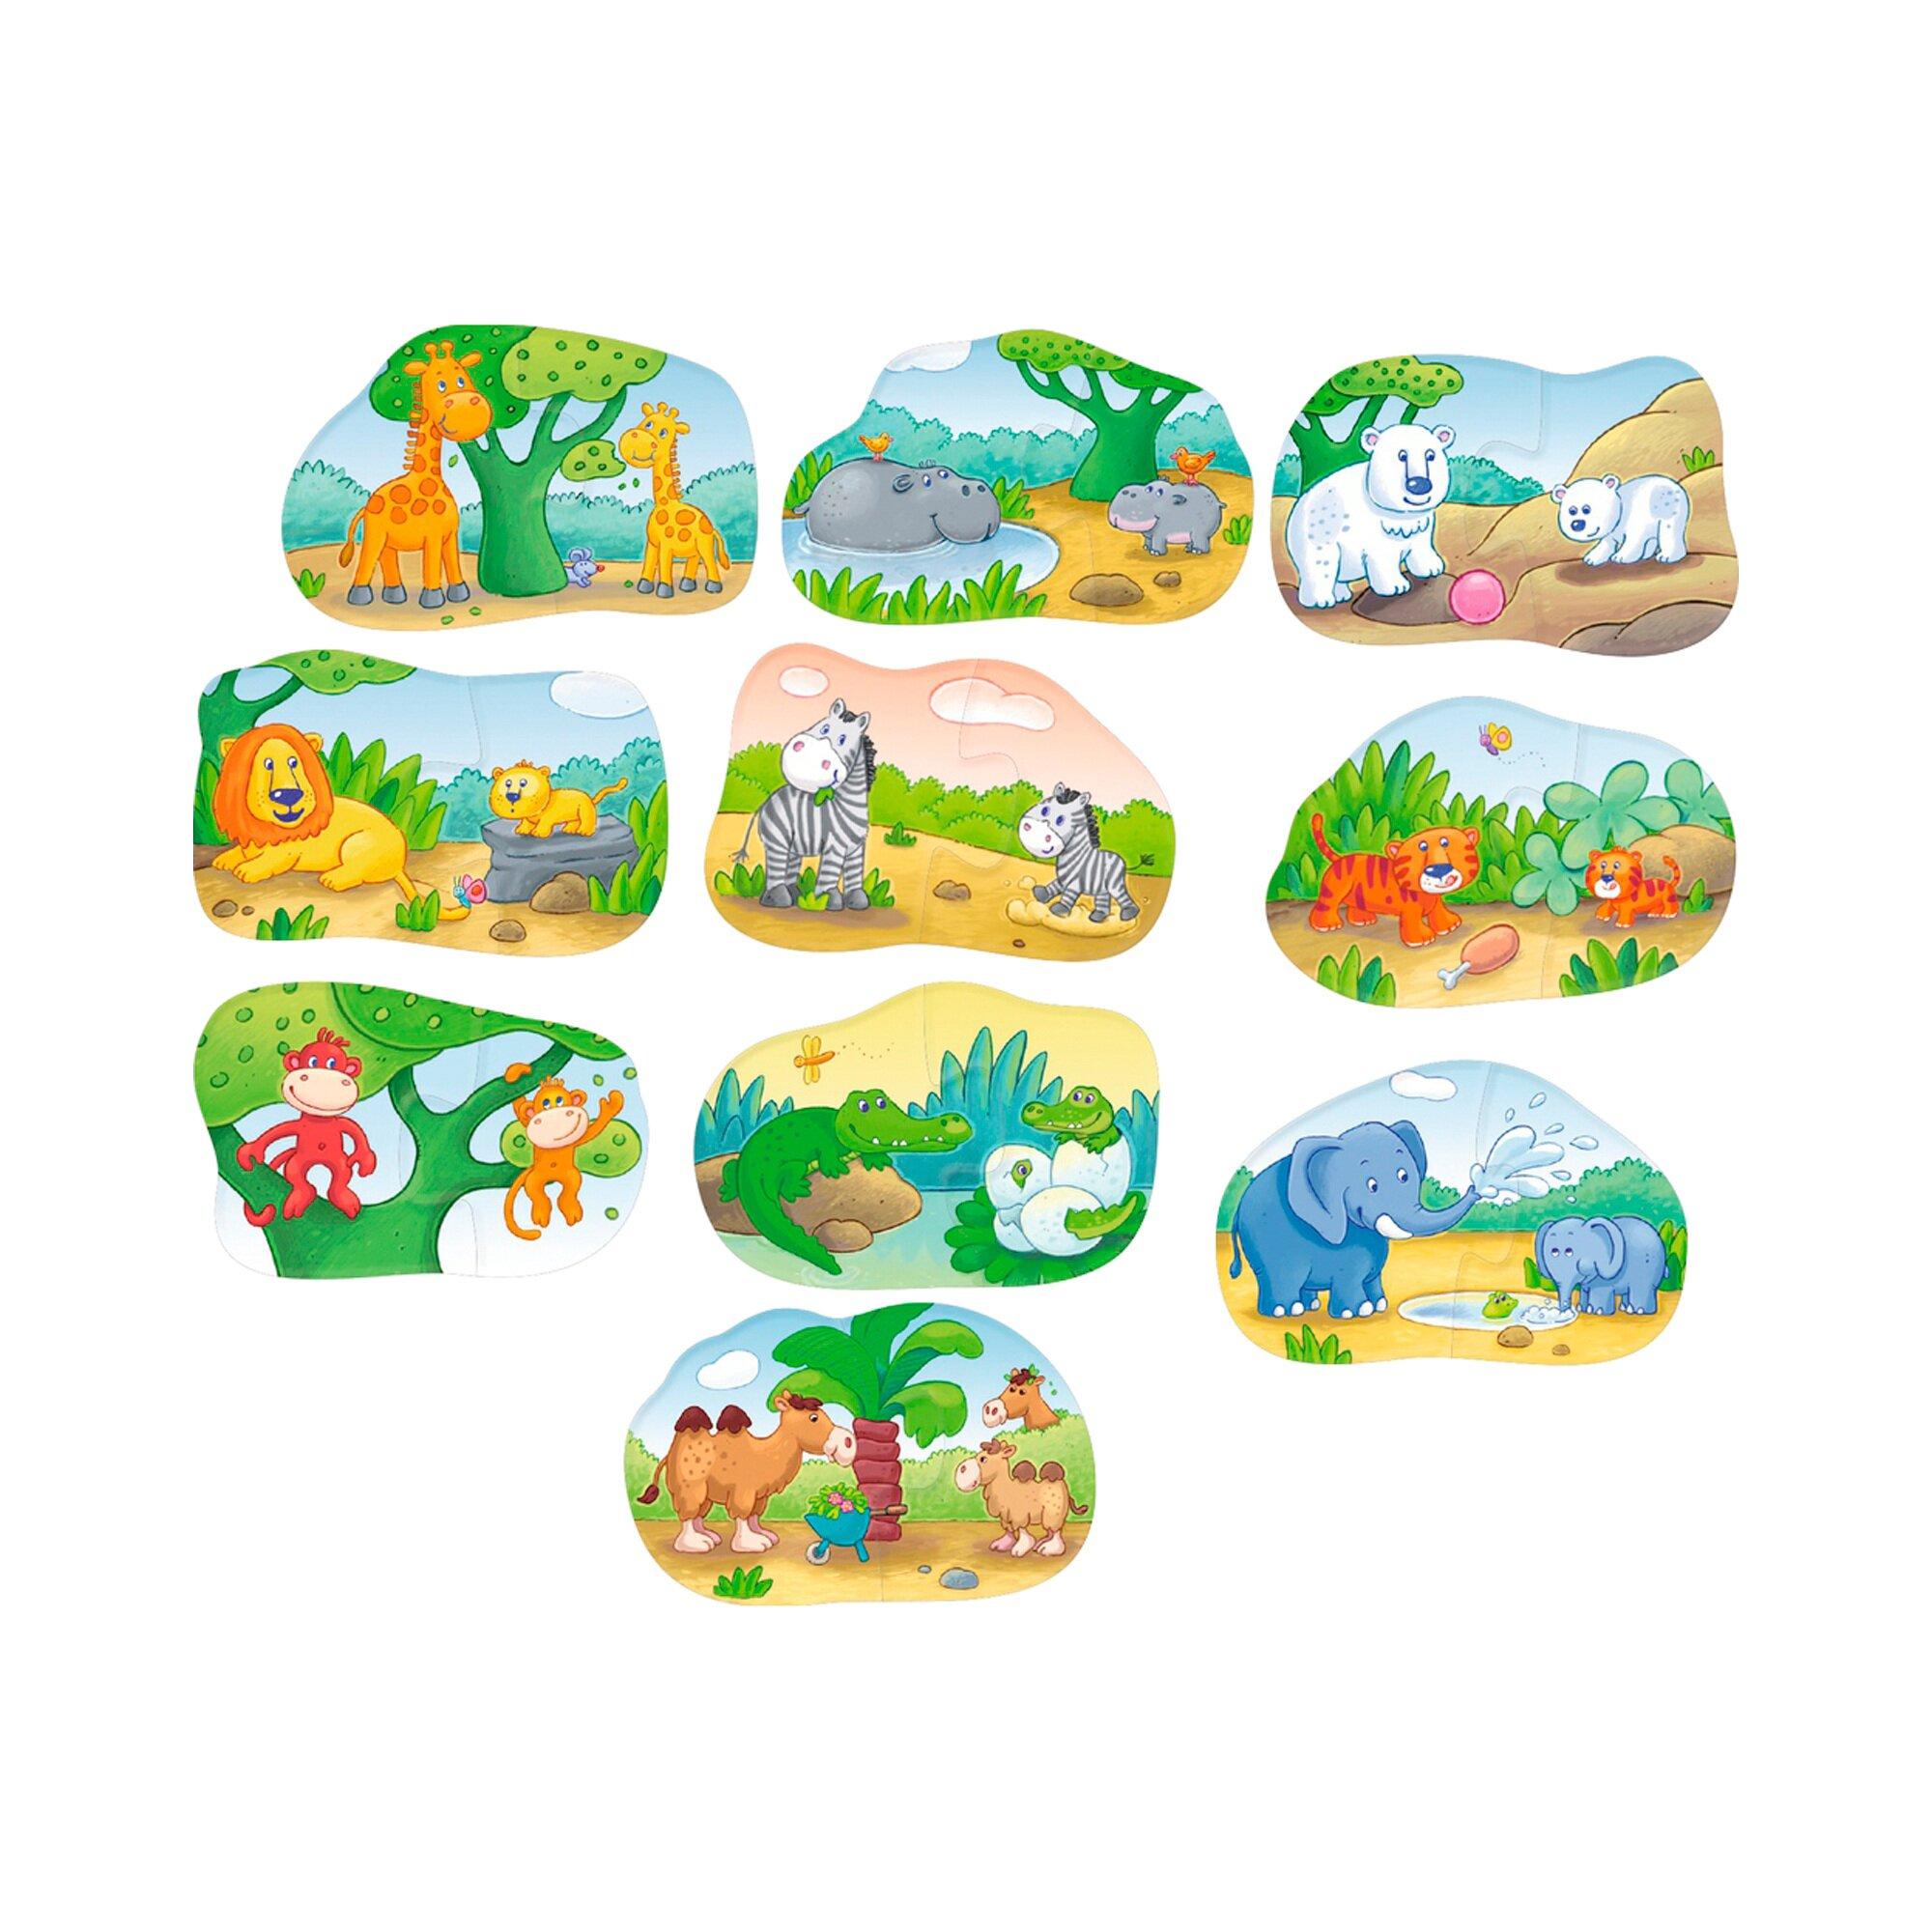 haba-1-2-puzzelei-tierkinder, 9.99 EUR @ babywalz-de